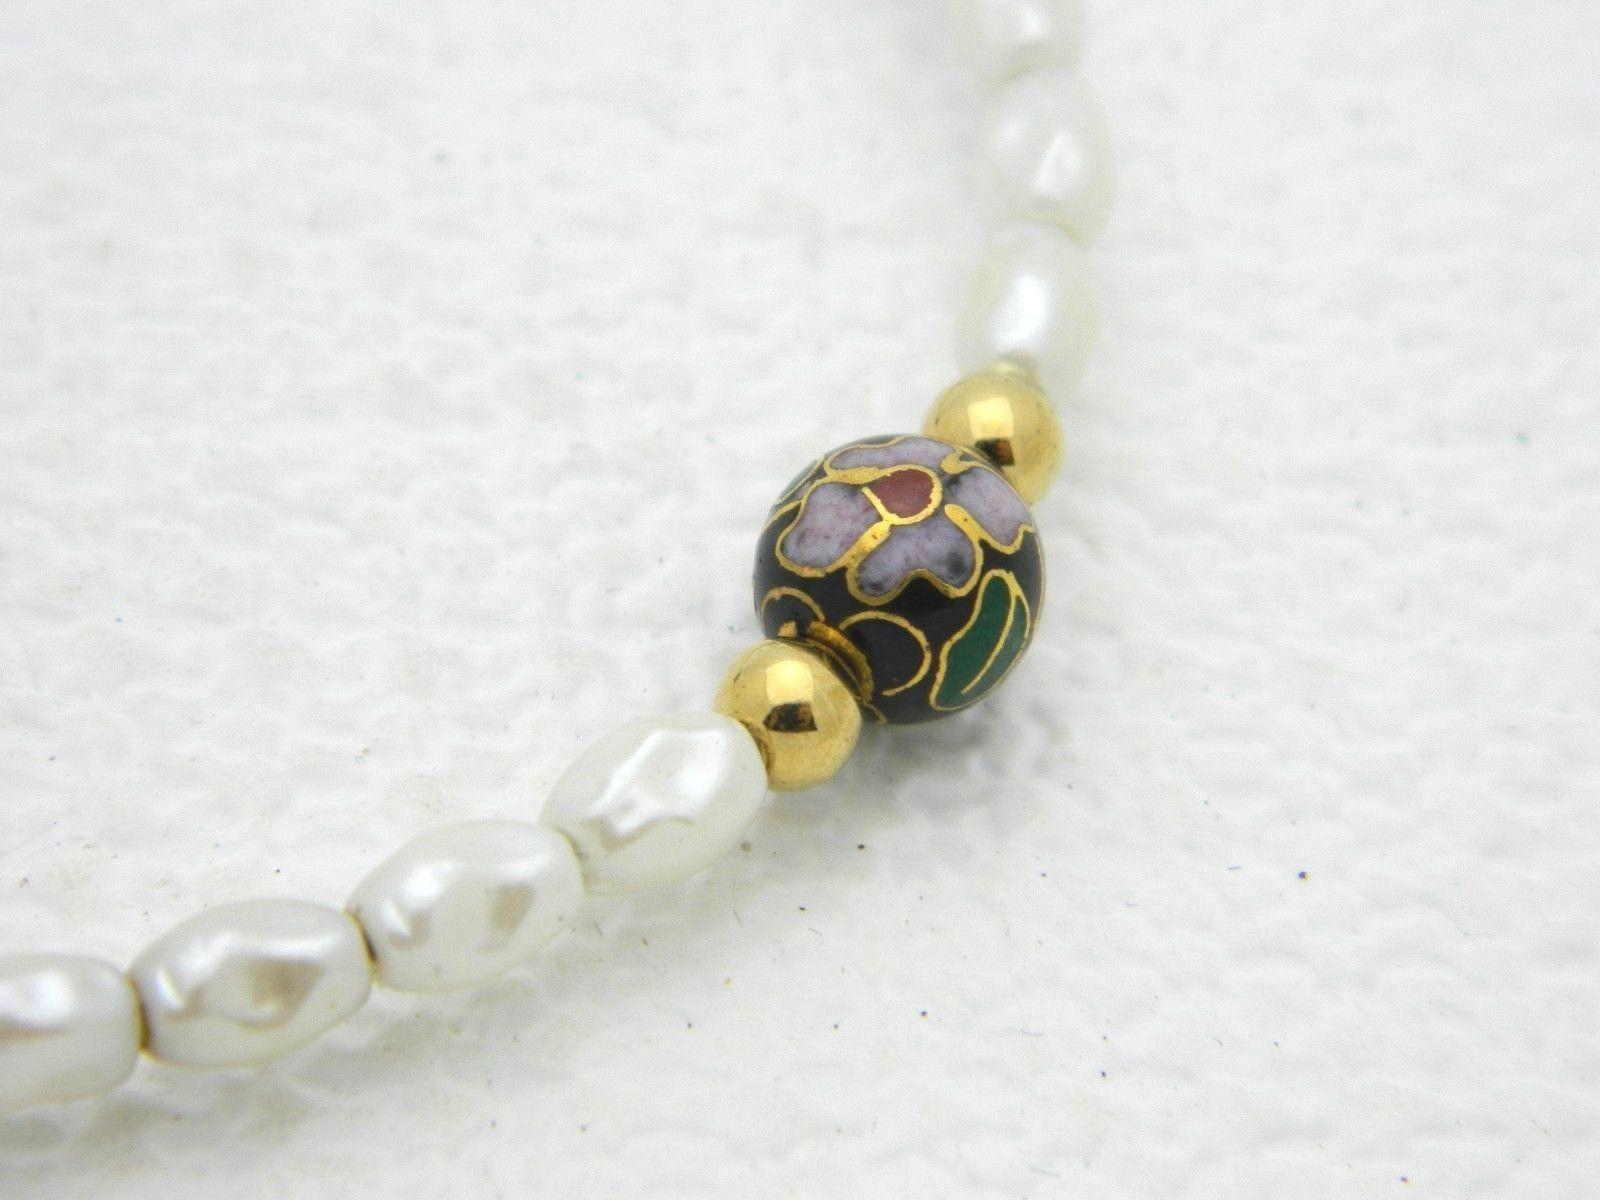 VTG Faux Pearl Black Cloisonne Floral Bead Bracelet image 2